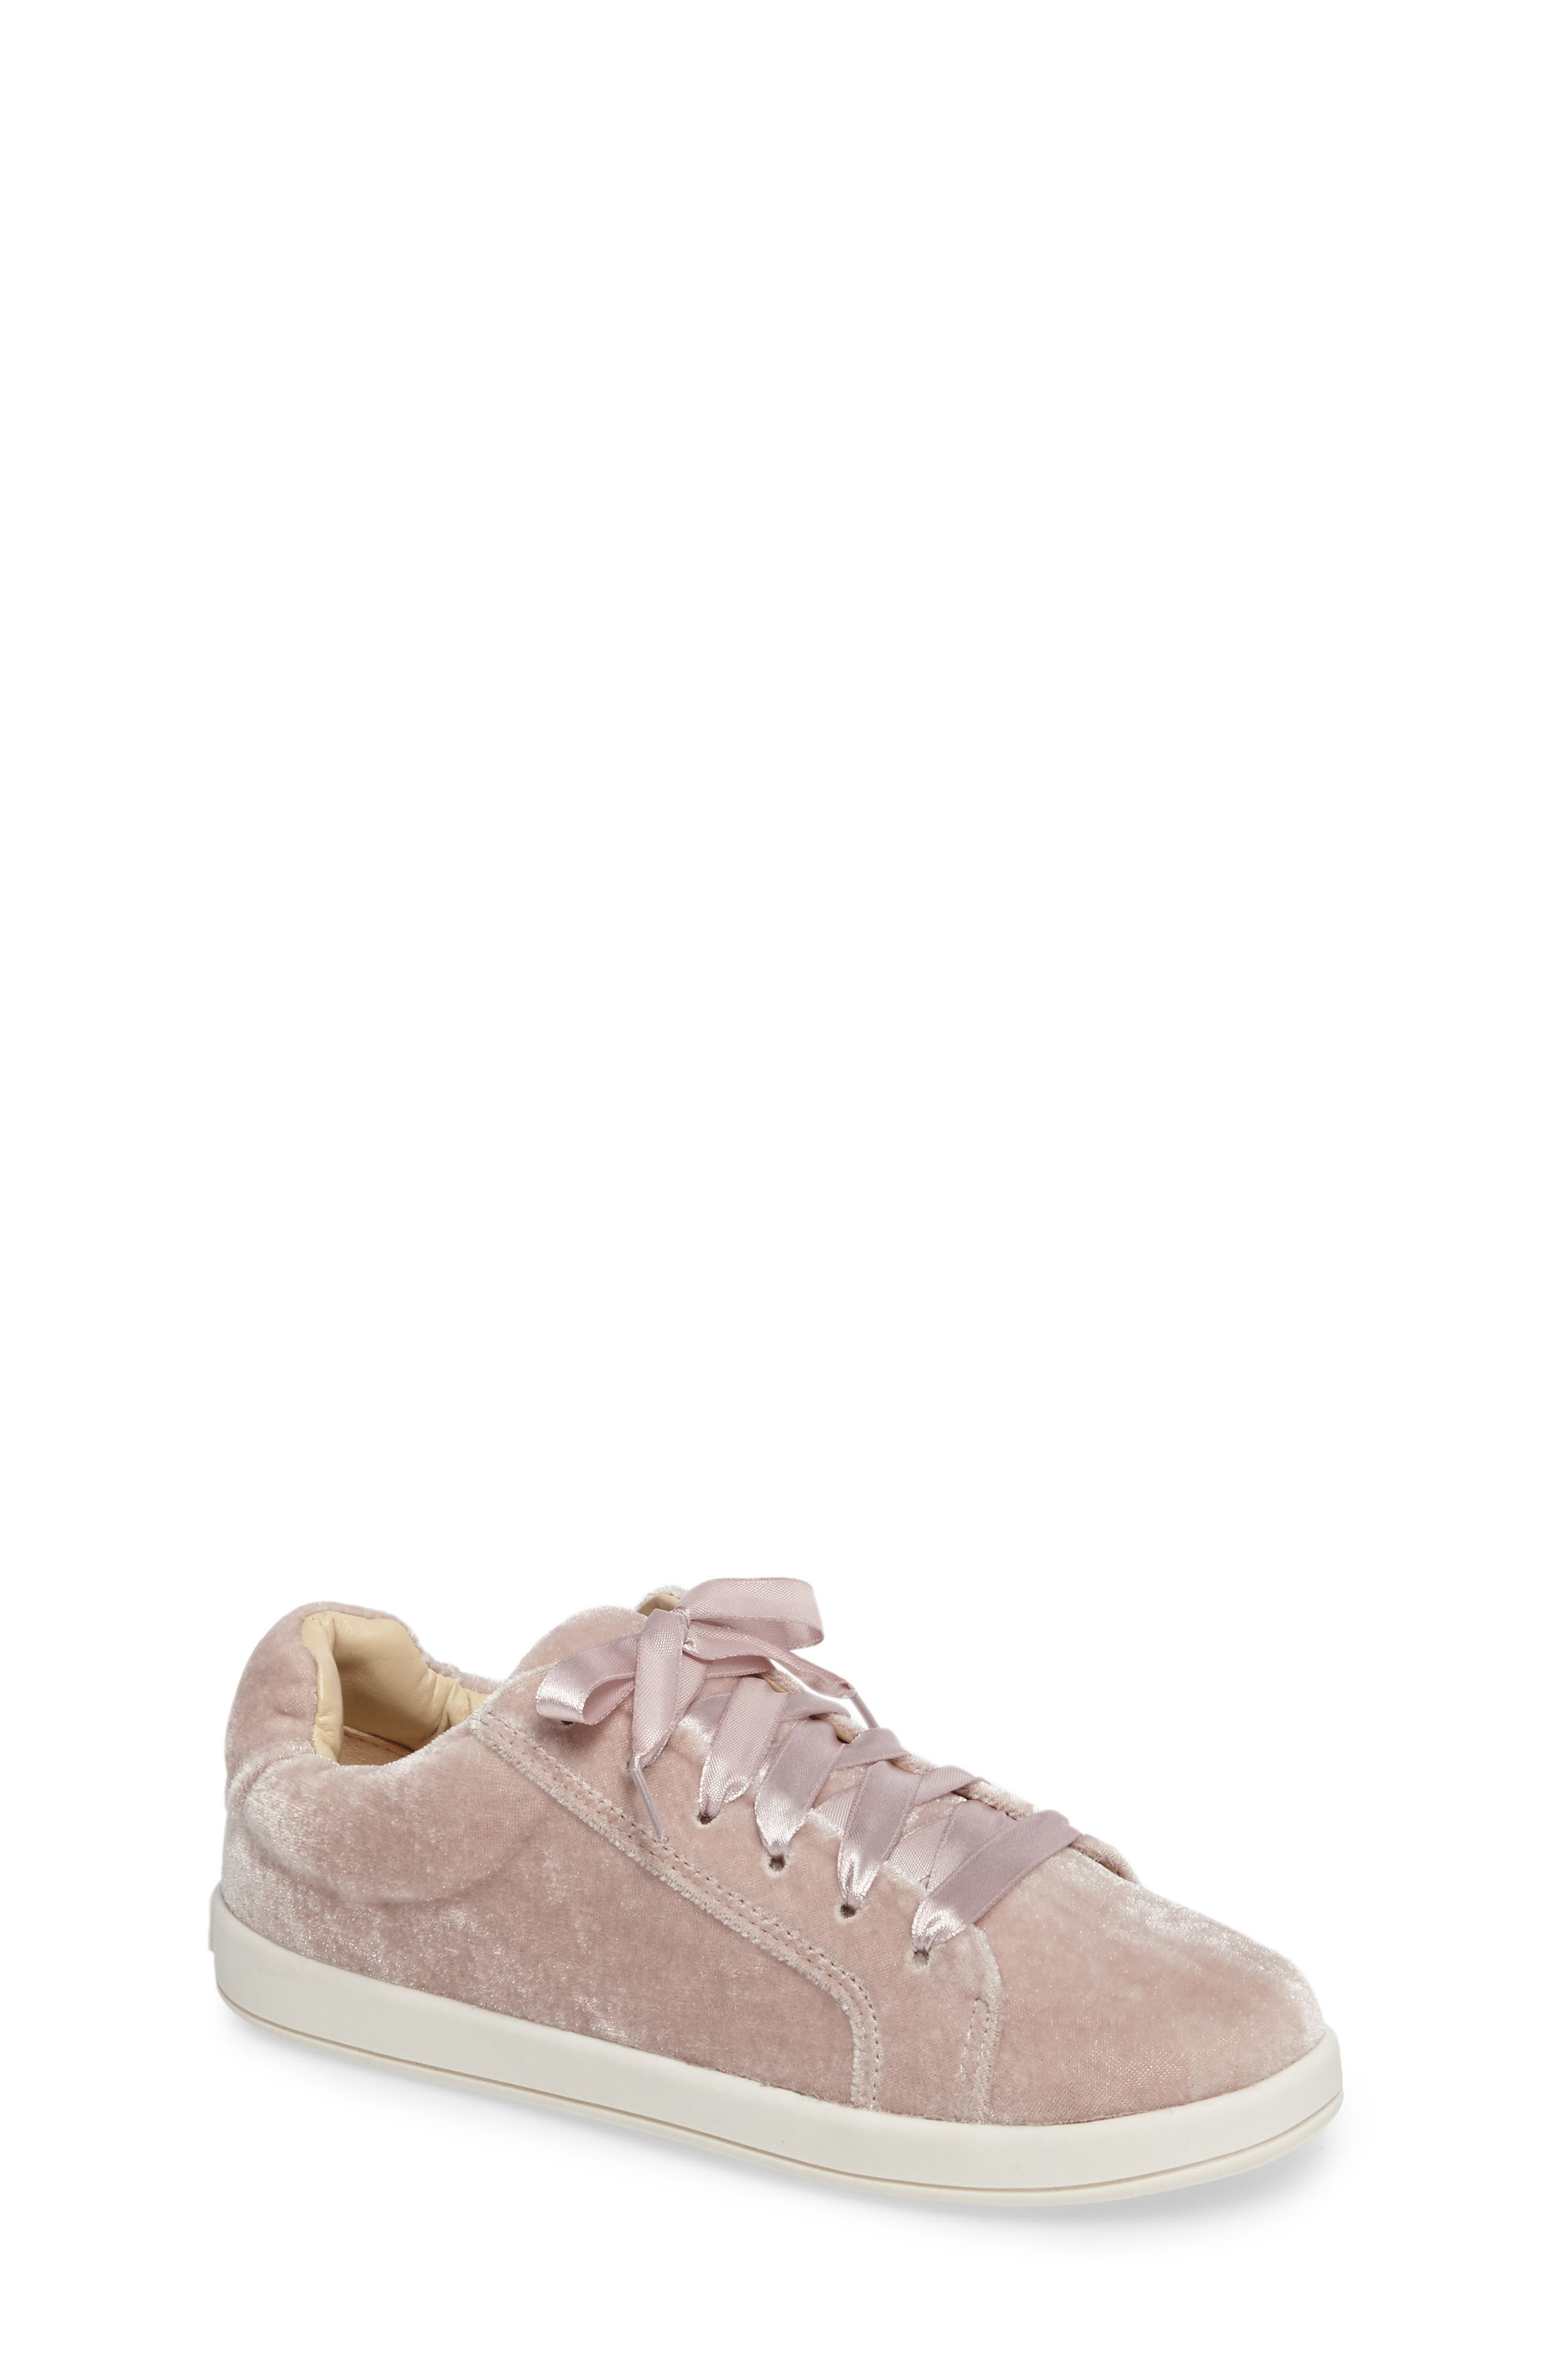 Cynthia Skye Sneaker,                         Main,                         color, 654